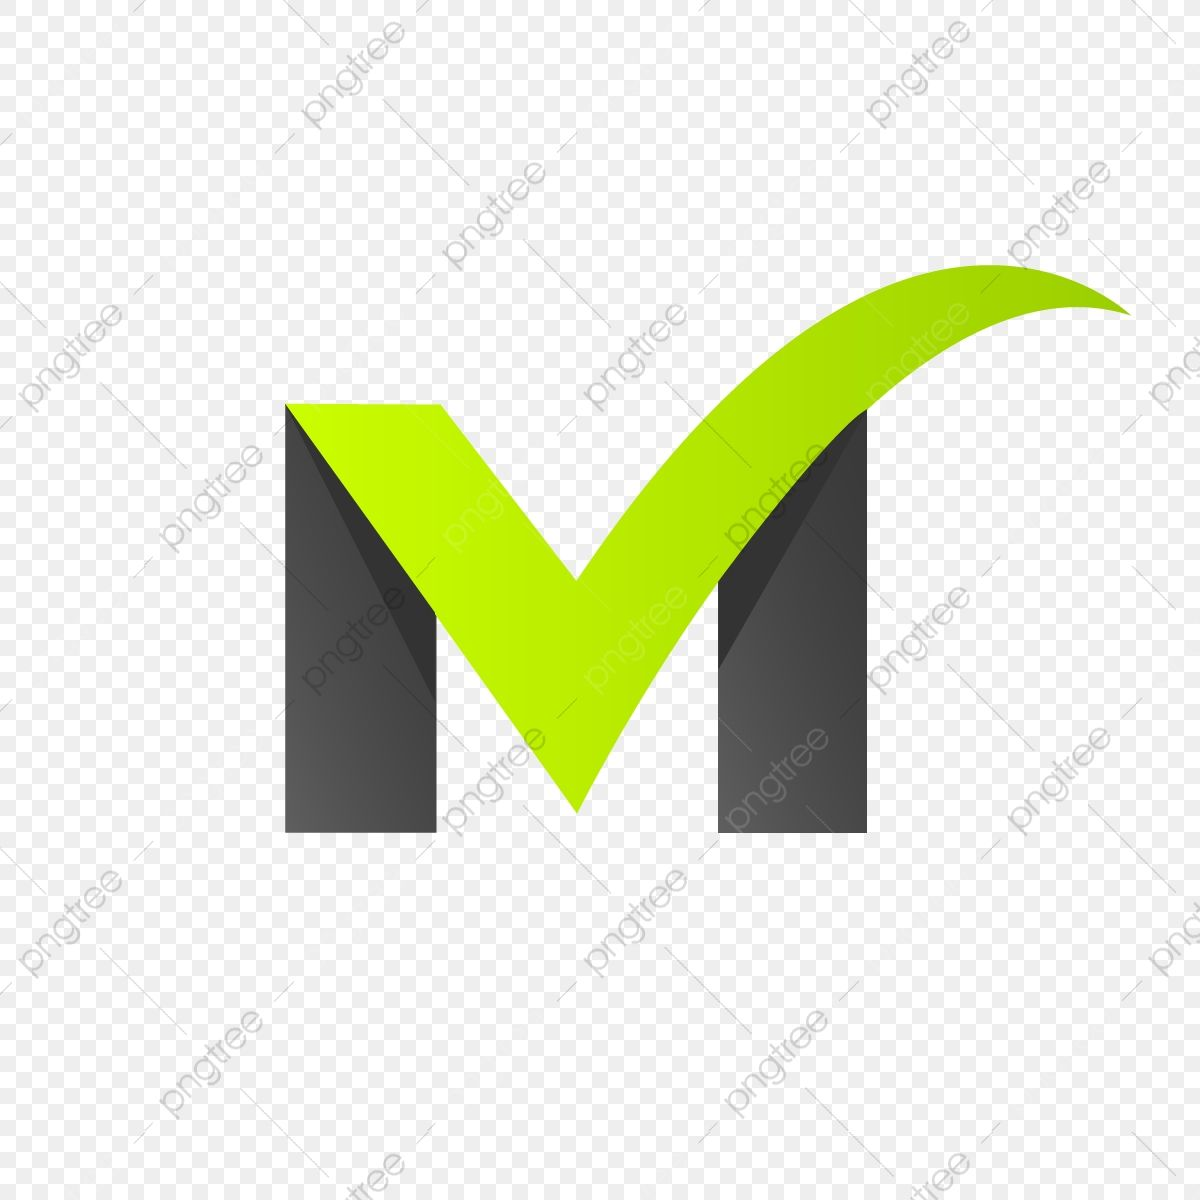 Vetor Livre Do Logotipo Da Letra M Carta Um Clipart M Logo Vetor Logotipo M Imagem Png E Vetor Para Download Gratuito In 2021 Letter Logo M Letter Vector Logo